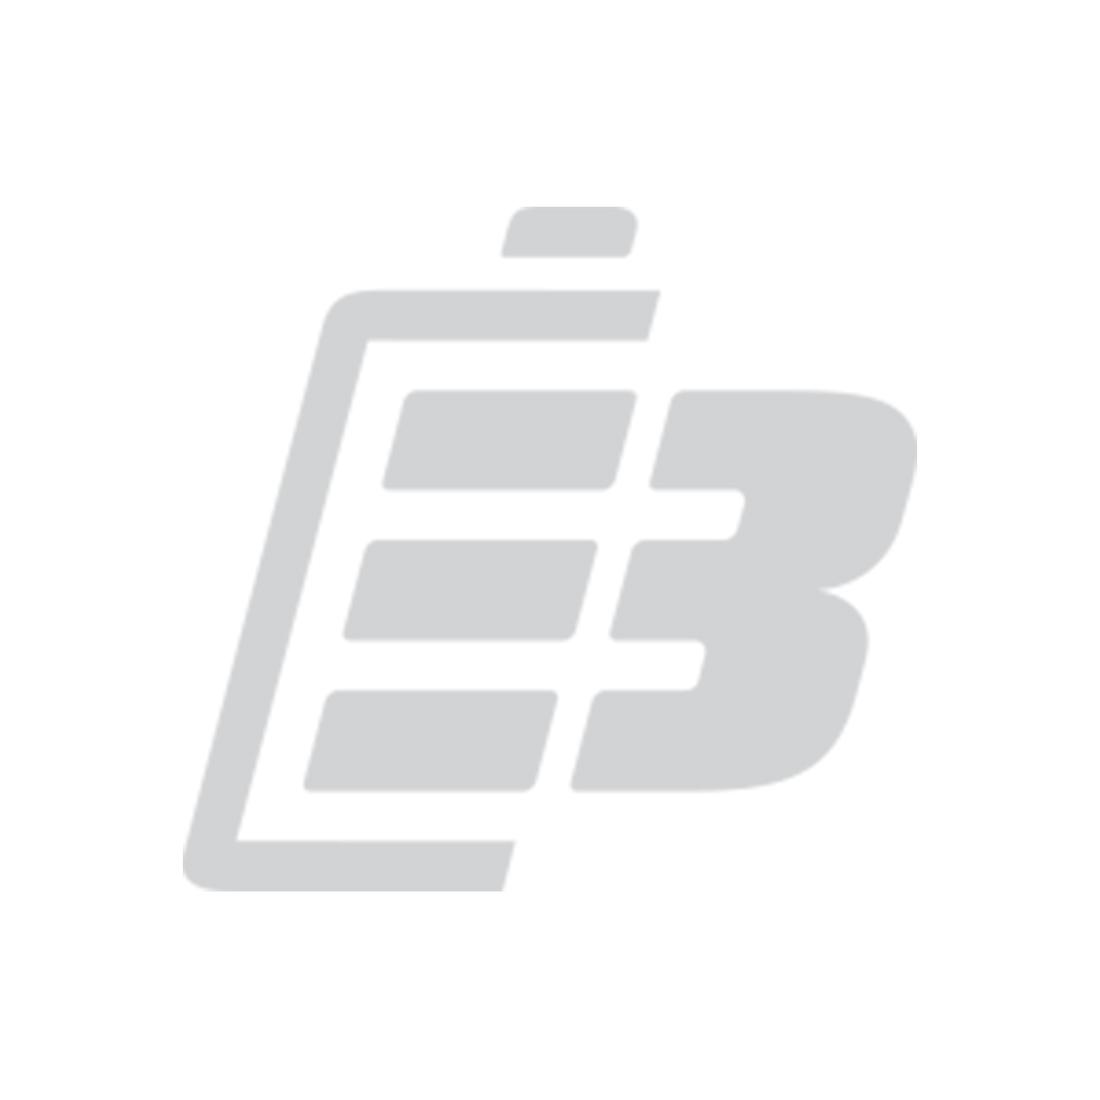 Efan C1 1-bay USB Charger